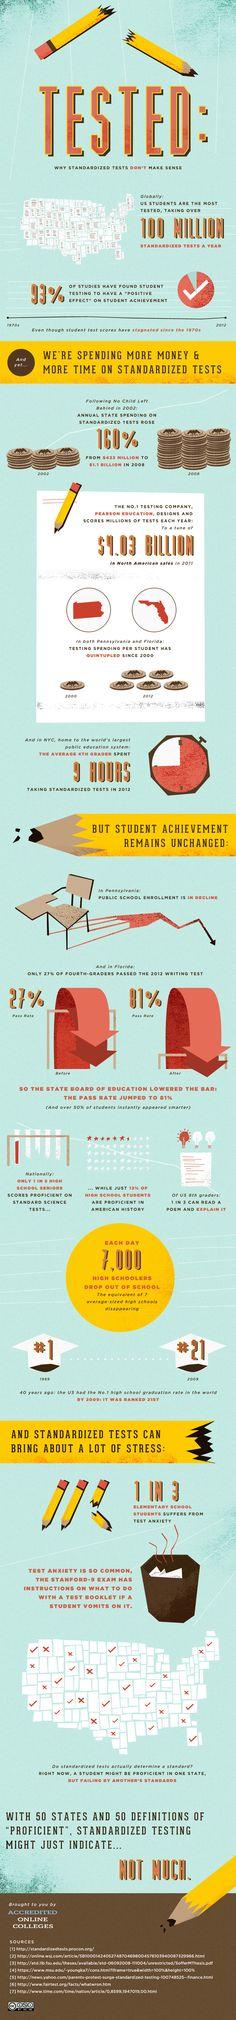 standardized testing infographic